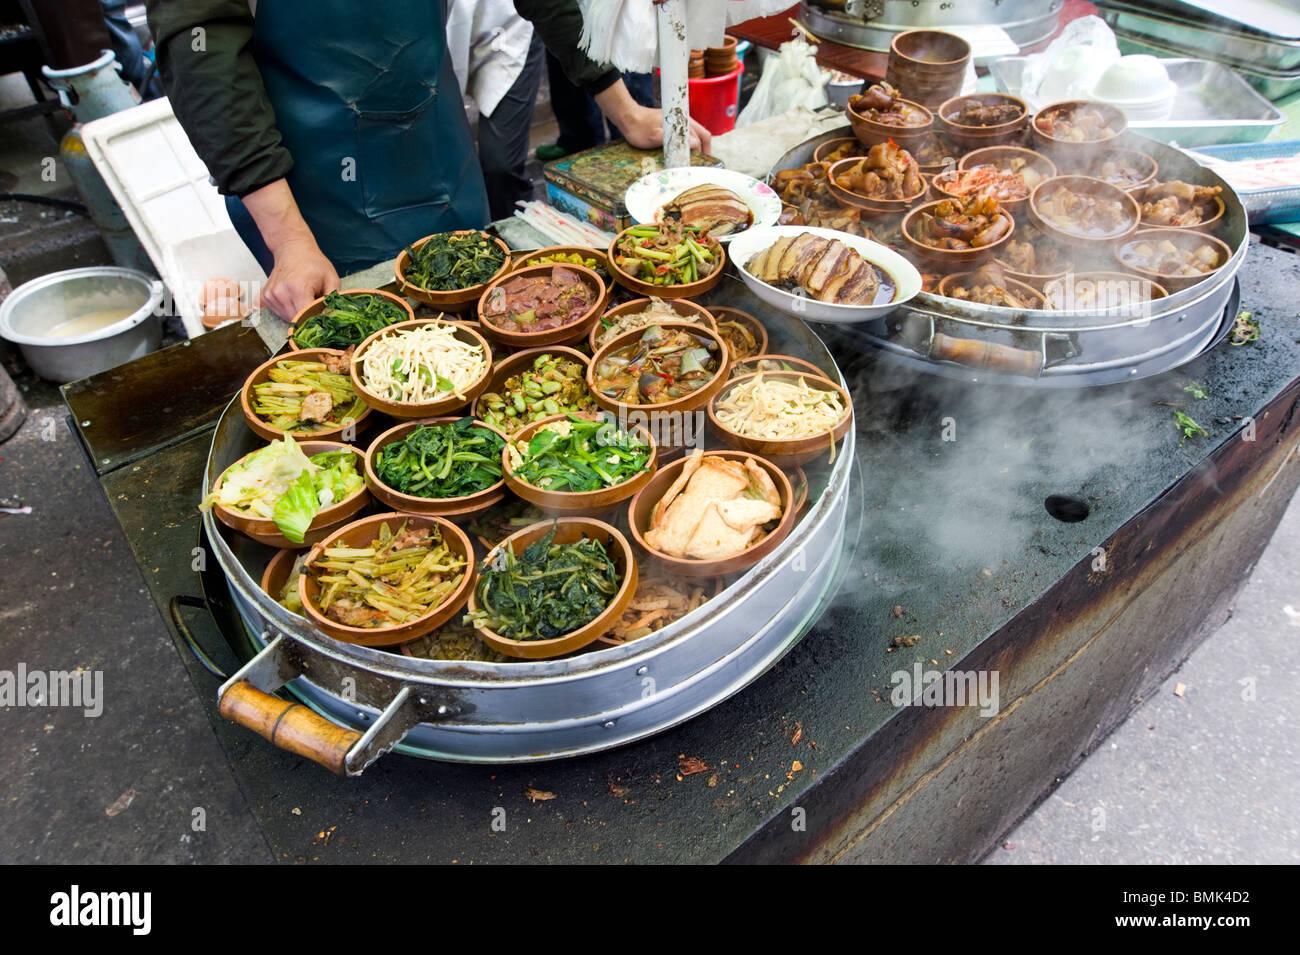 Hot street food, Shanghai, China - Stock Image